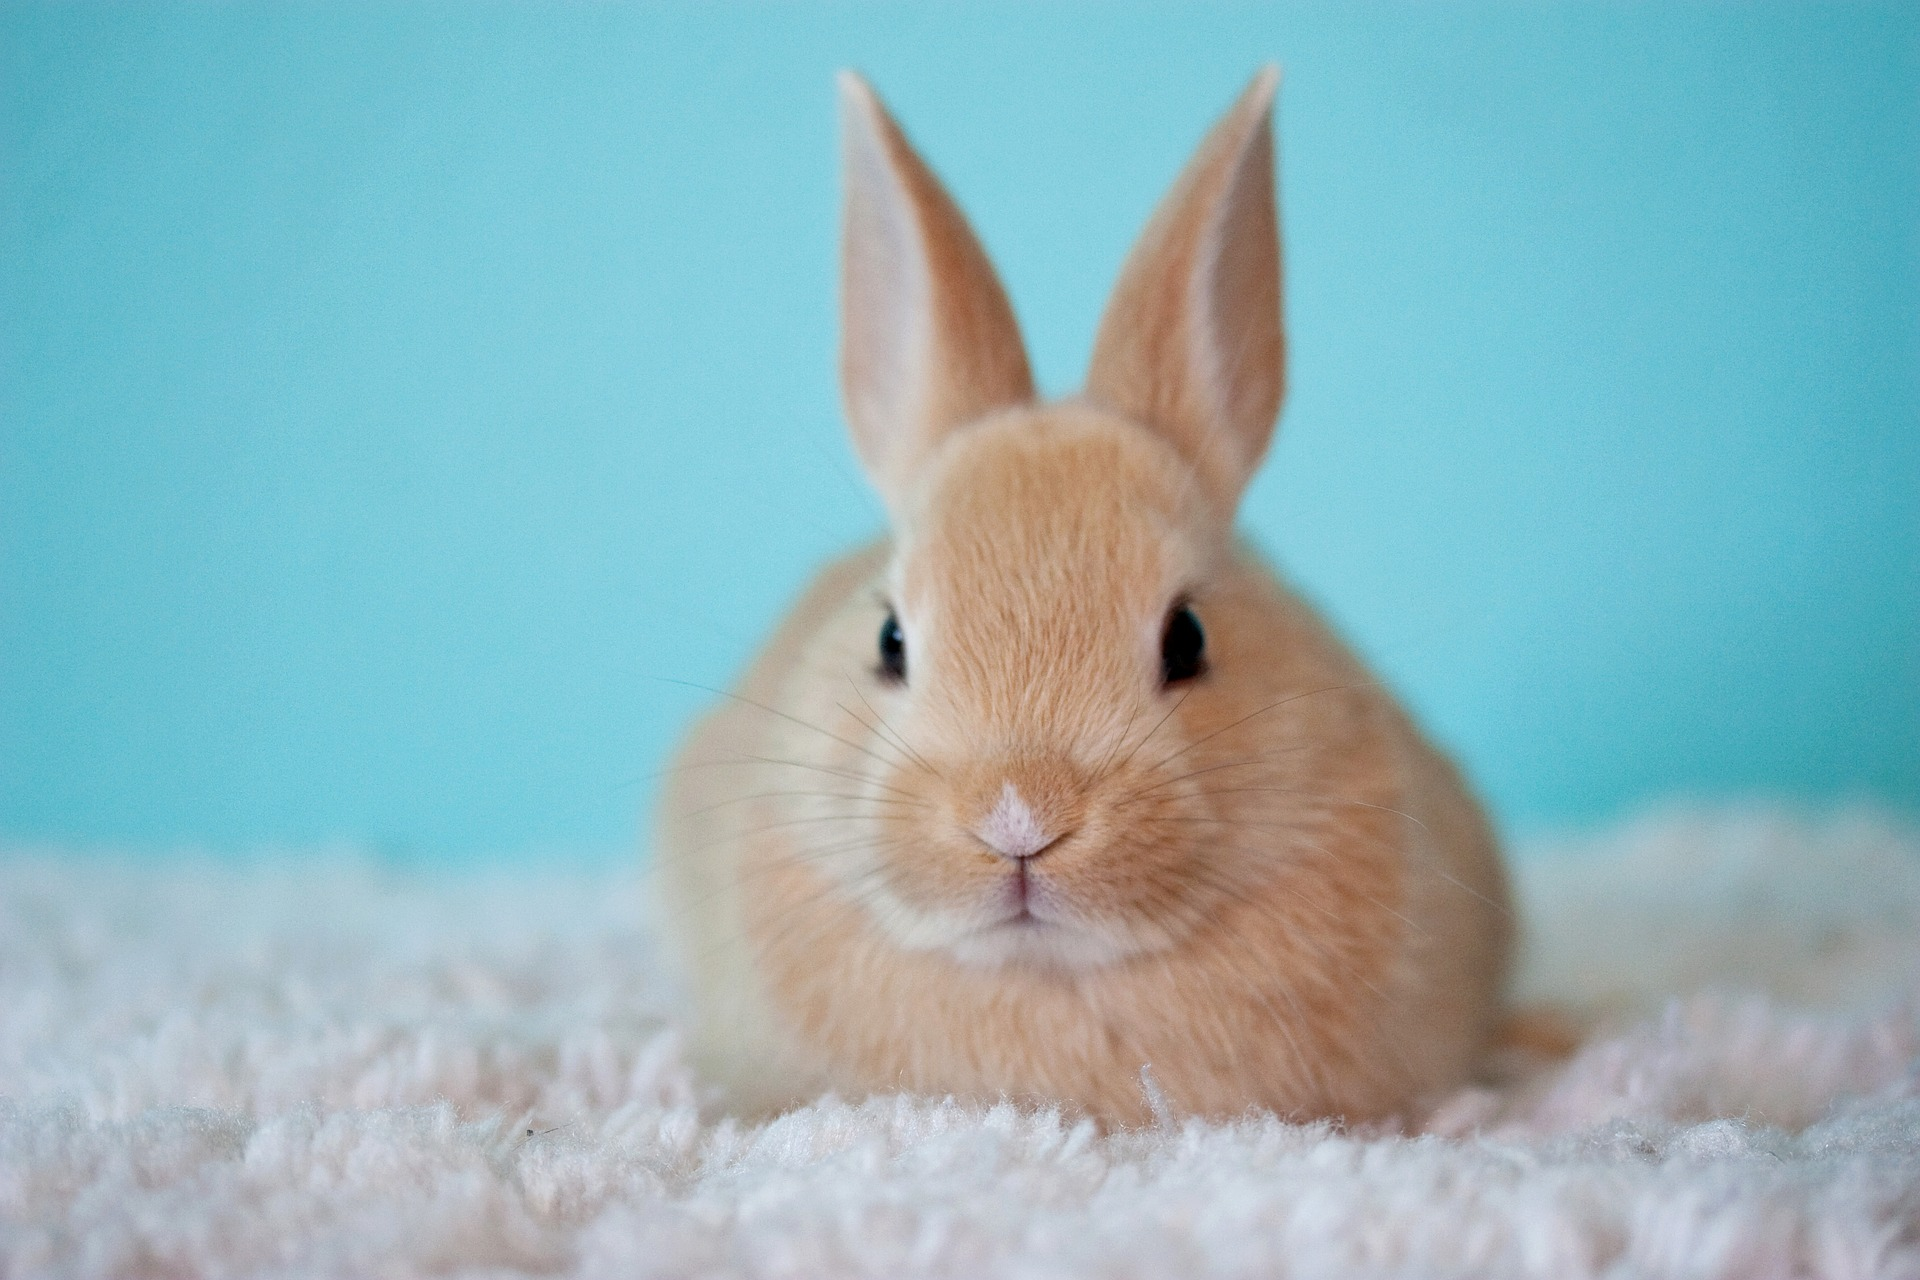 Breaking: China Greenlights New Non-Animal Cosmetics Tests